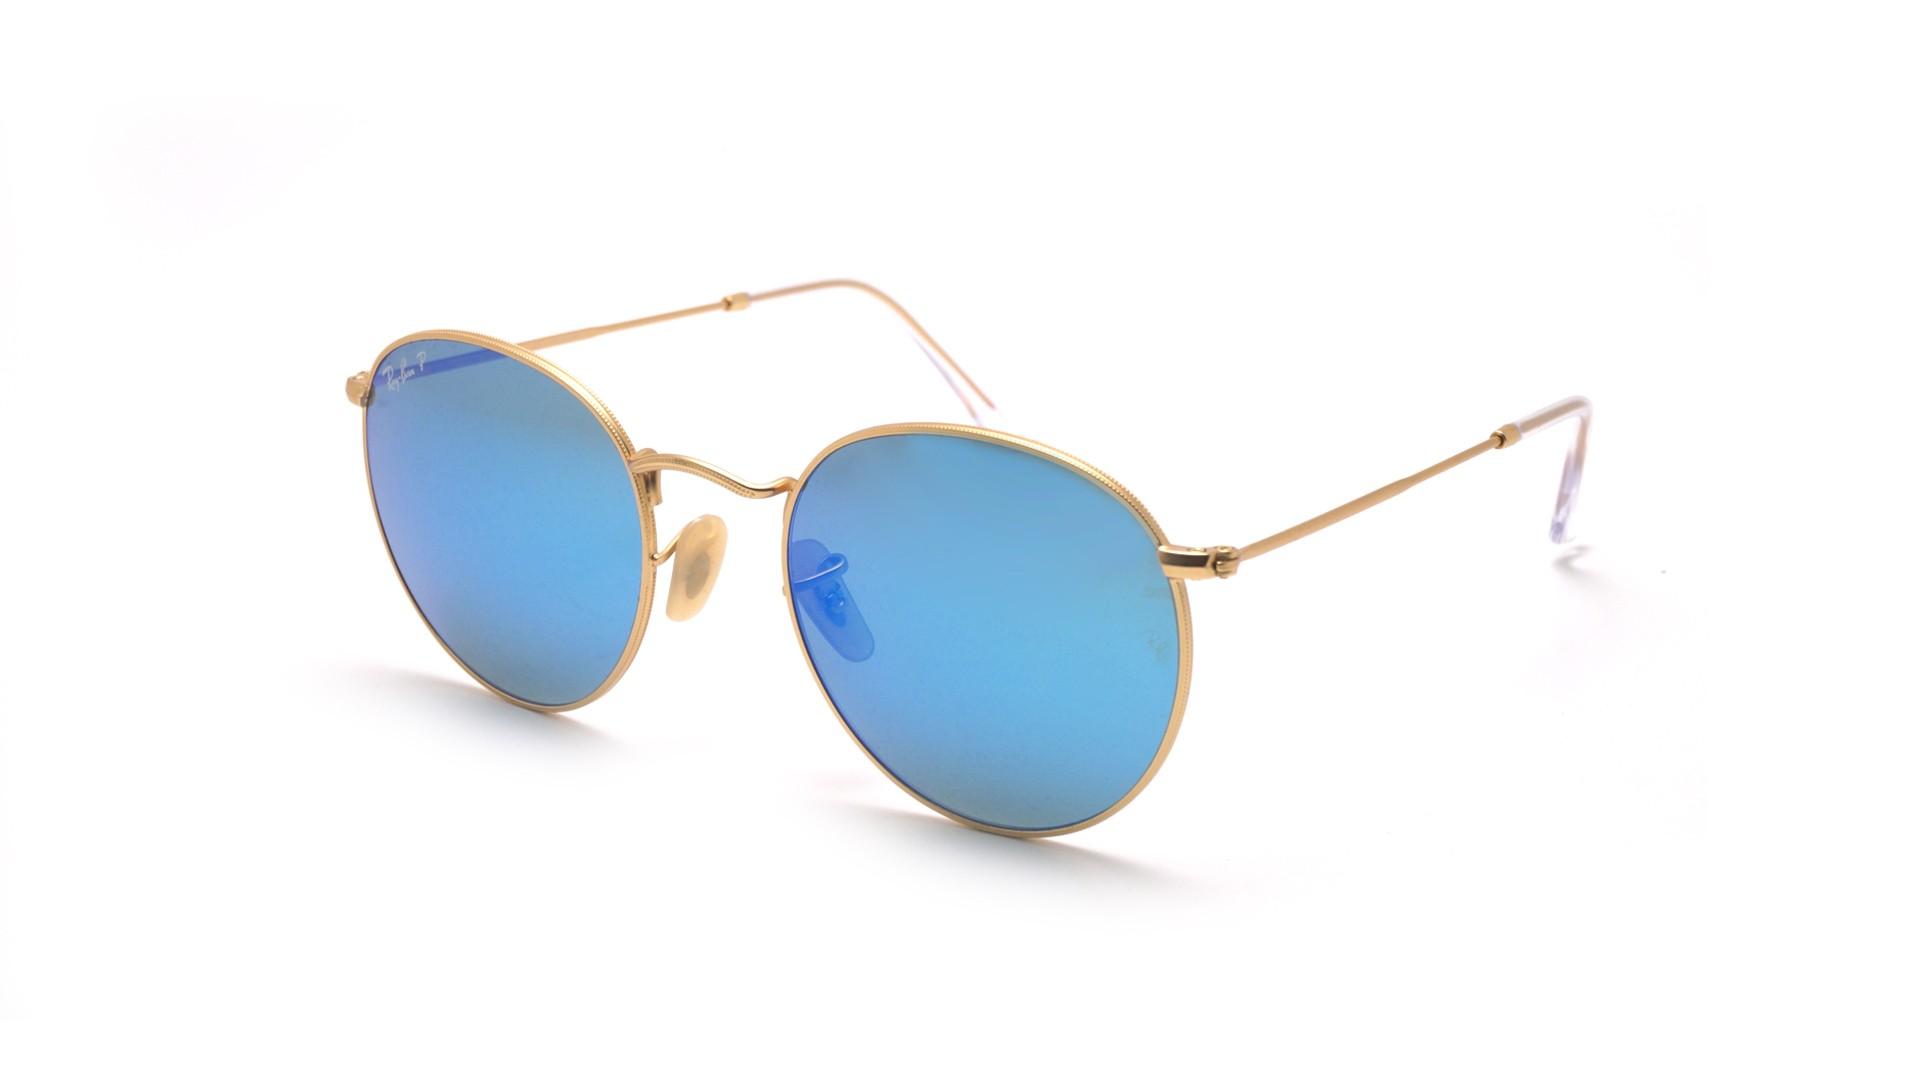 104544ebec Sunglasses Ray-Ban Round Metal Gold Flash Lenses Matte RB3447 112 4L 53-21  Large Polarized Mirror